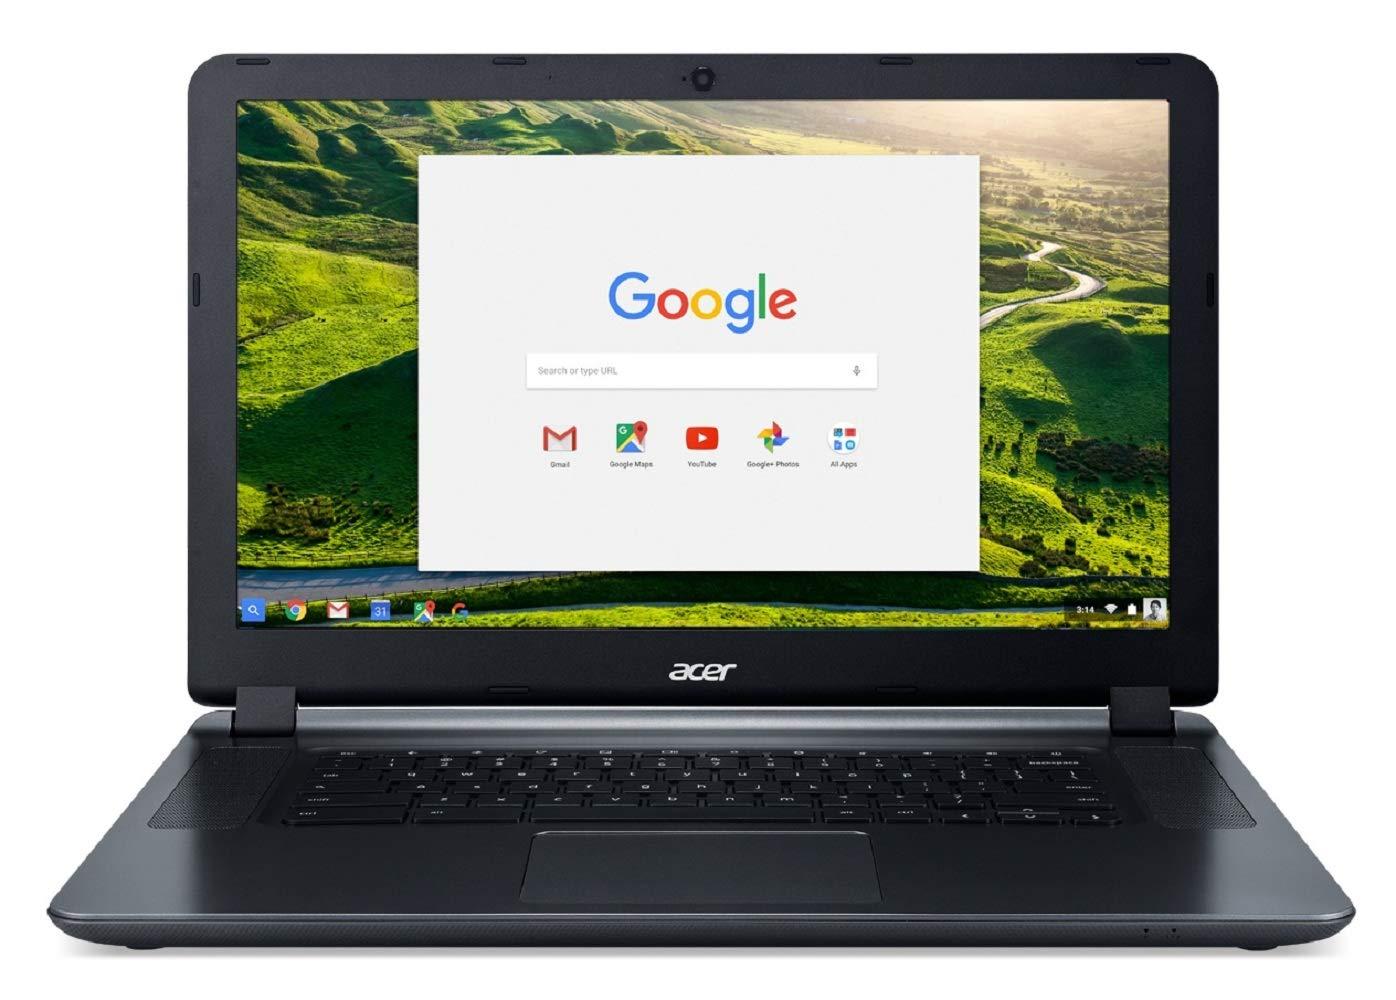 Acer Chromebook 15 Intel Celeron 1.6 GHz 4 GB Ram 32GB Flash Chrome OS (Renewed)